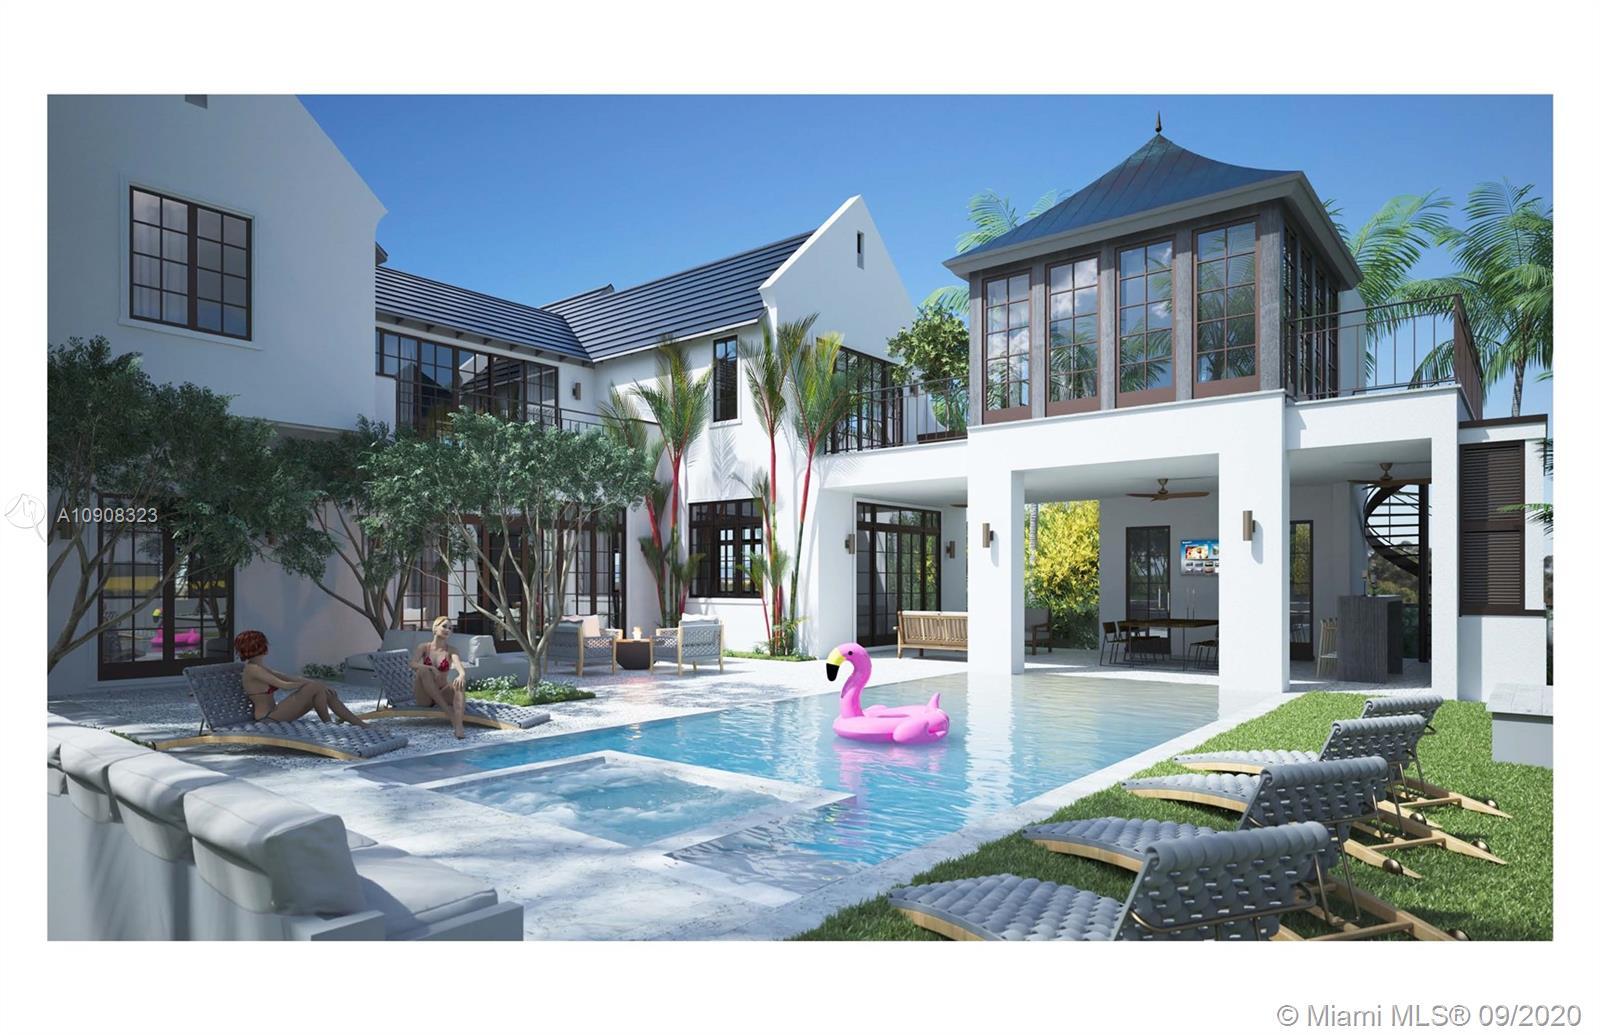 Real Estate Photo A10908323